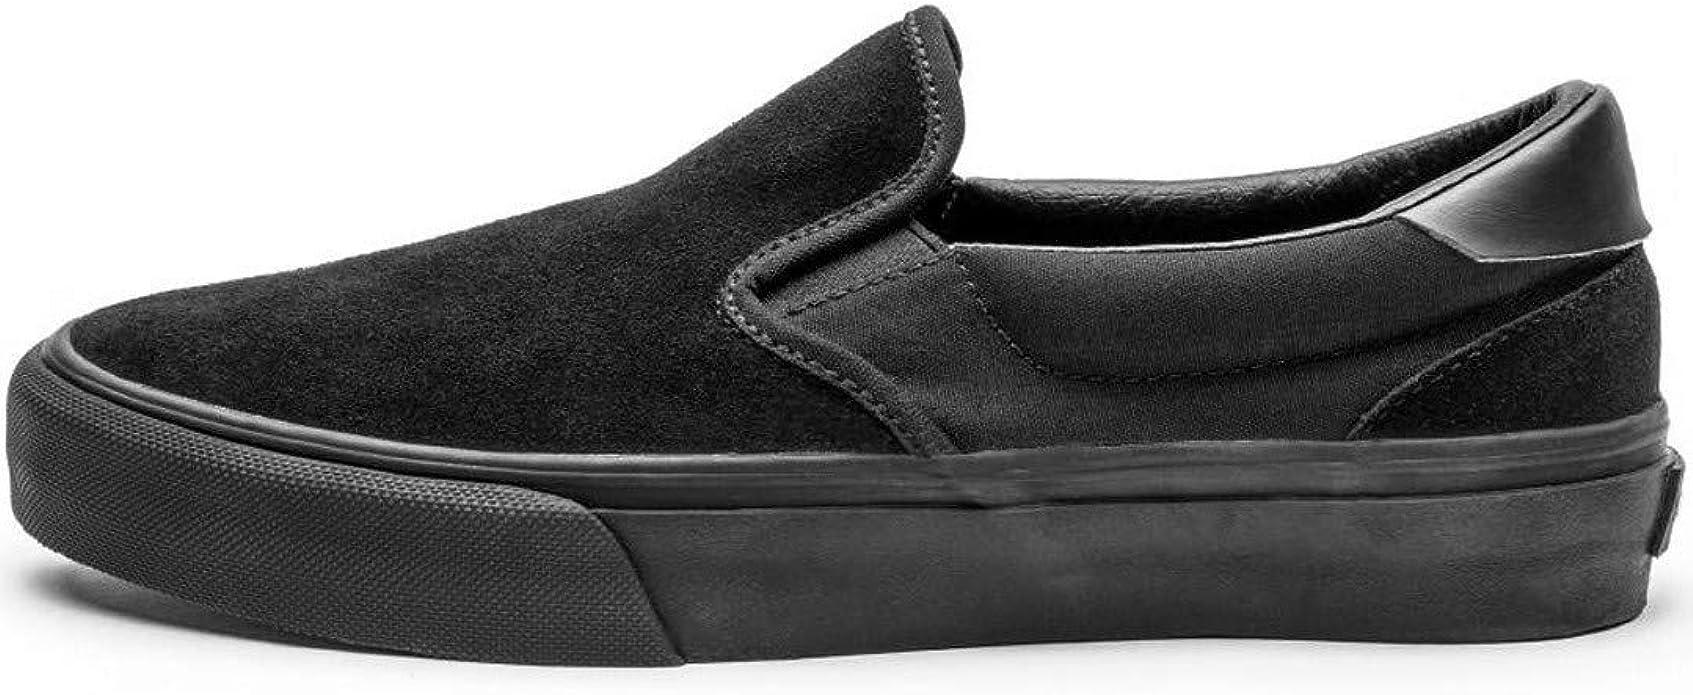 Black Suede Skate Shoes